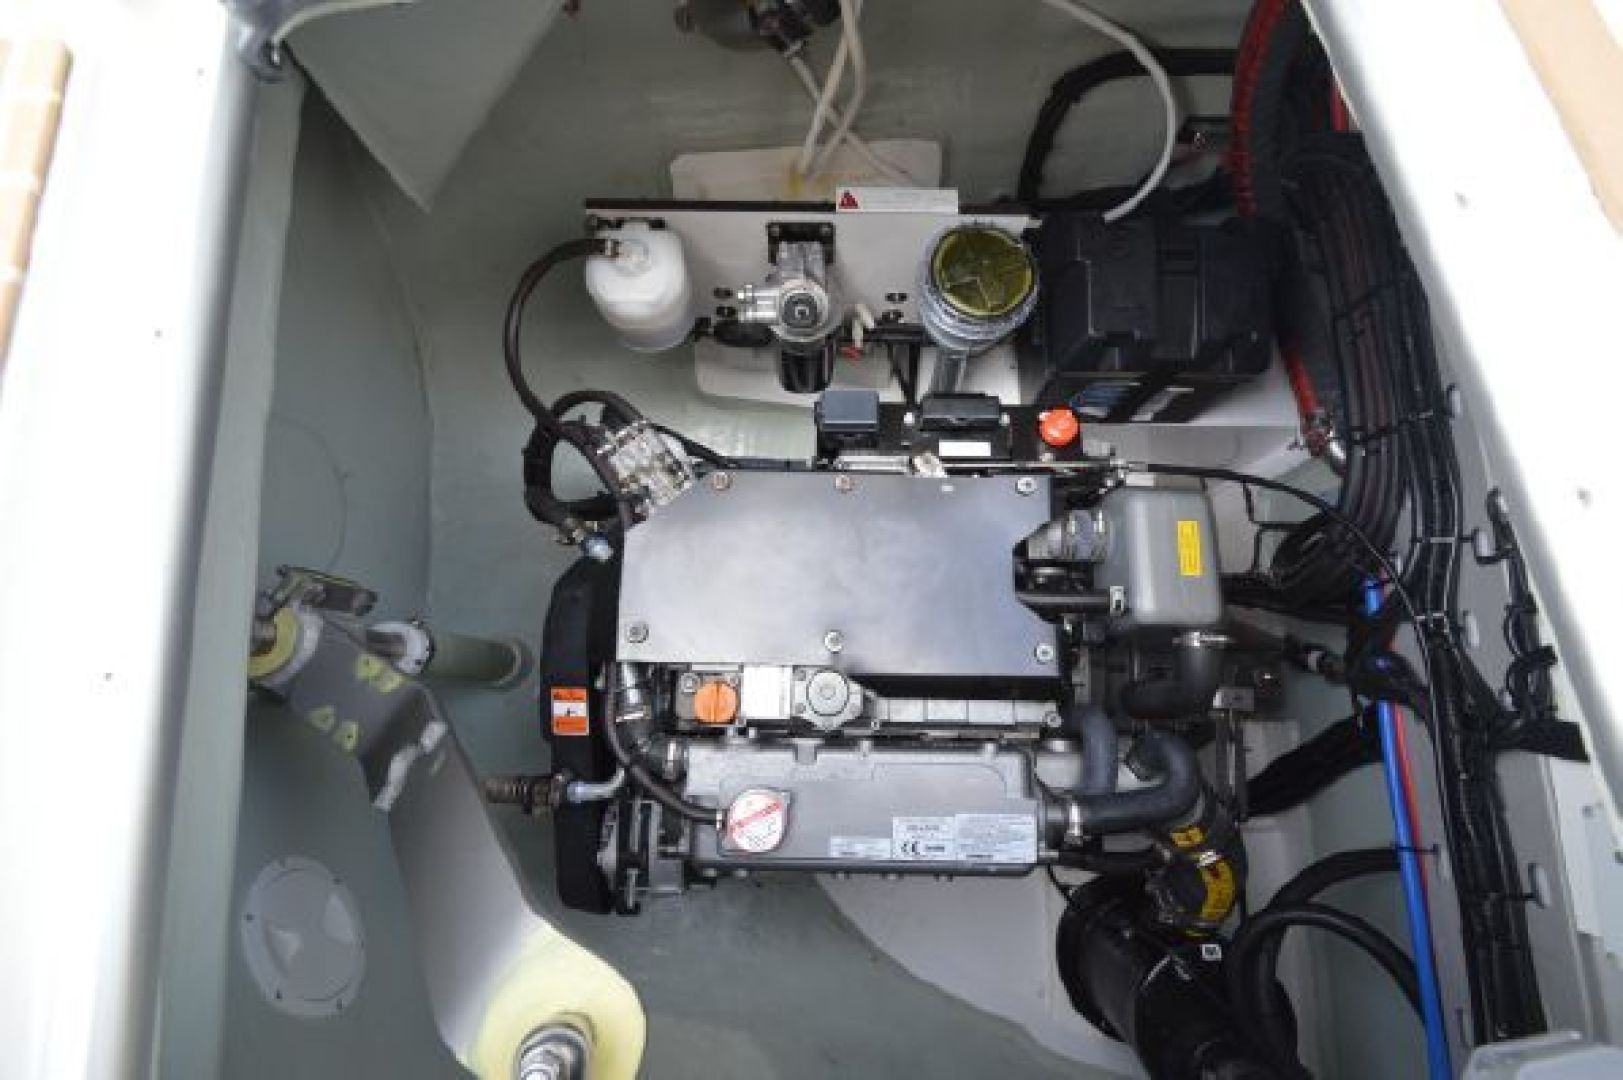 Leopard-44 2016-Grateful Fort Lauderdale-Florida-United States-Engine Compartment 3-1471297 | Thumbnail